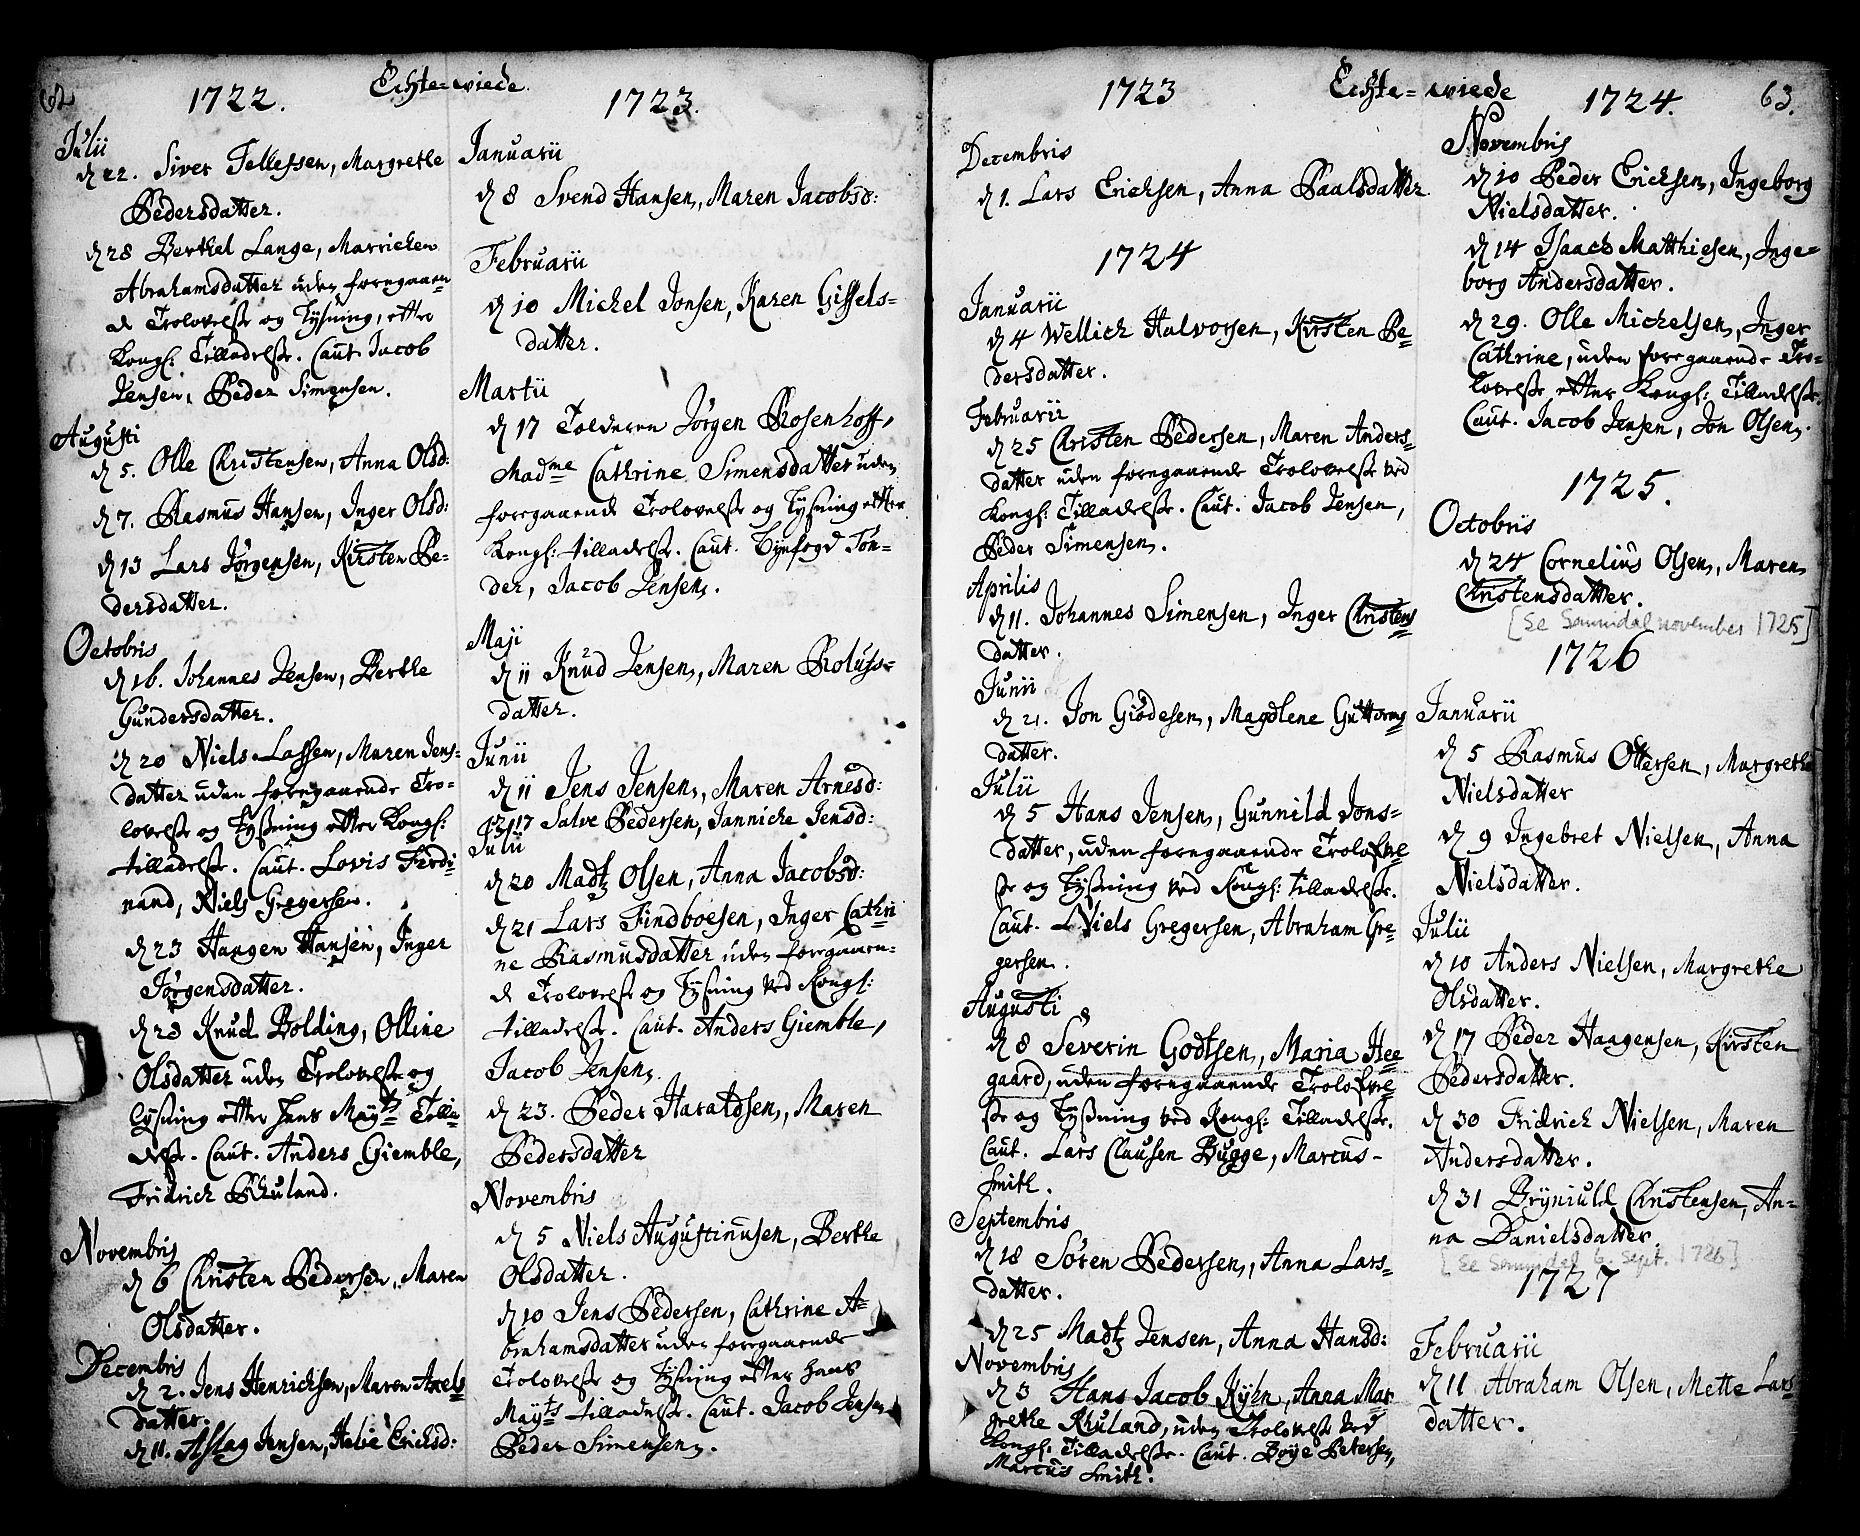 SAKO, Kragerø kirkebøker, F/Fa/L0001: Ministerialbok nr. 1, 1702-1766, s. 62-63